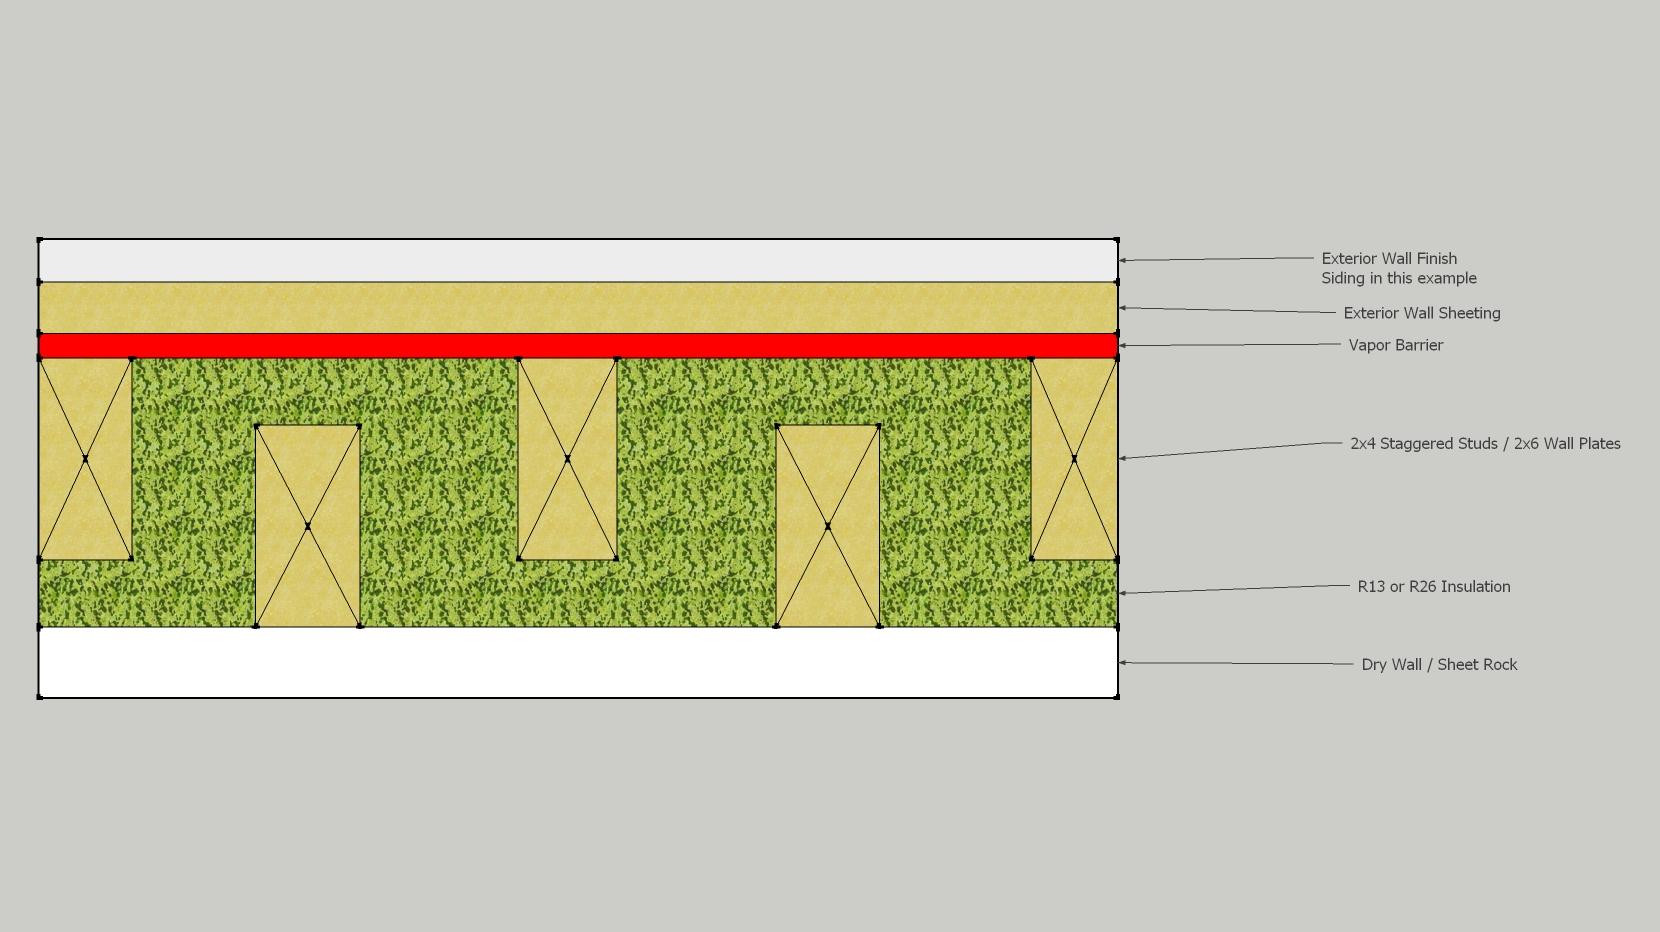 94 Toyota Corolla Wire Harness likewise 98 F150 Fog Light Switch Wiring Diagram likewise w3bz furthermore 2005 Dakota Wiring Diagram likewise Mitsubishi Eclipse 2000. on toyota celica gts radio wiring diagram